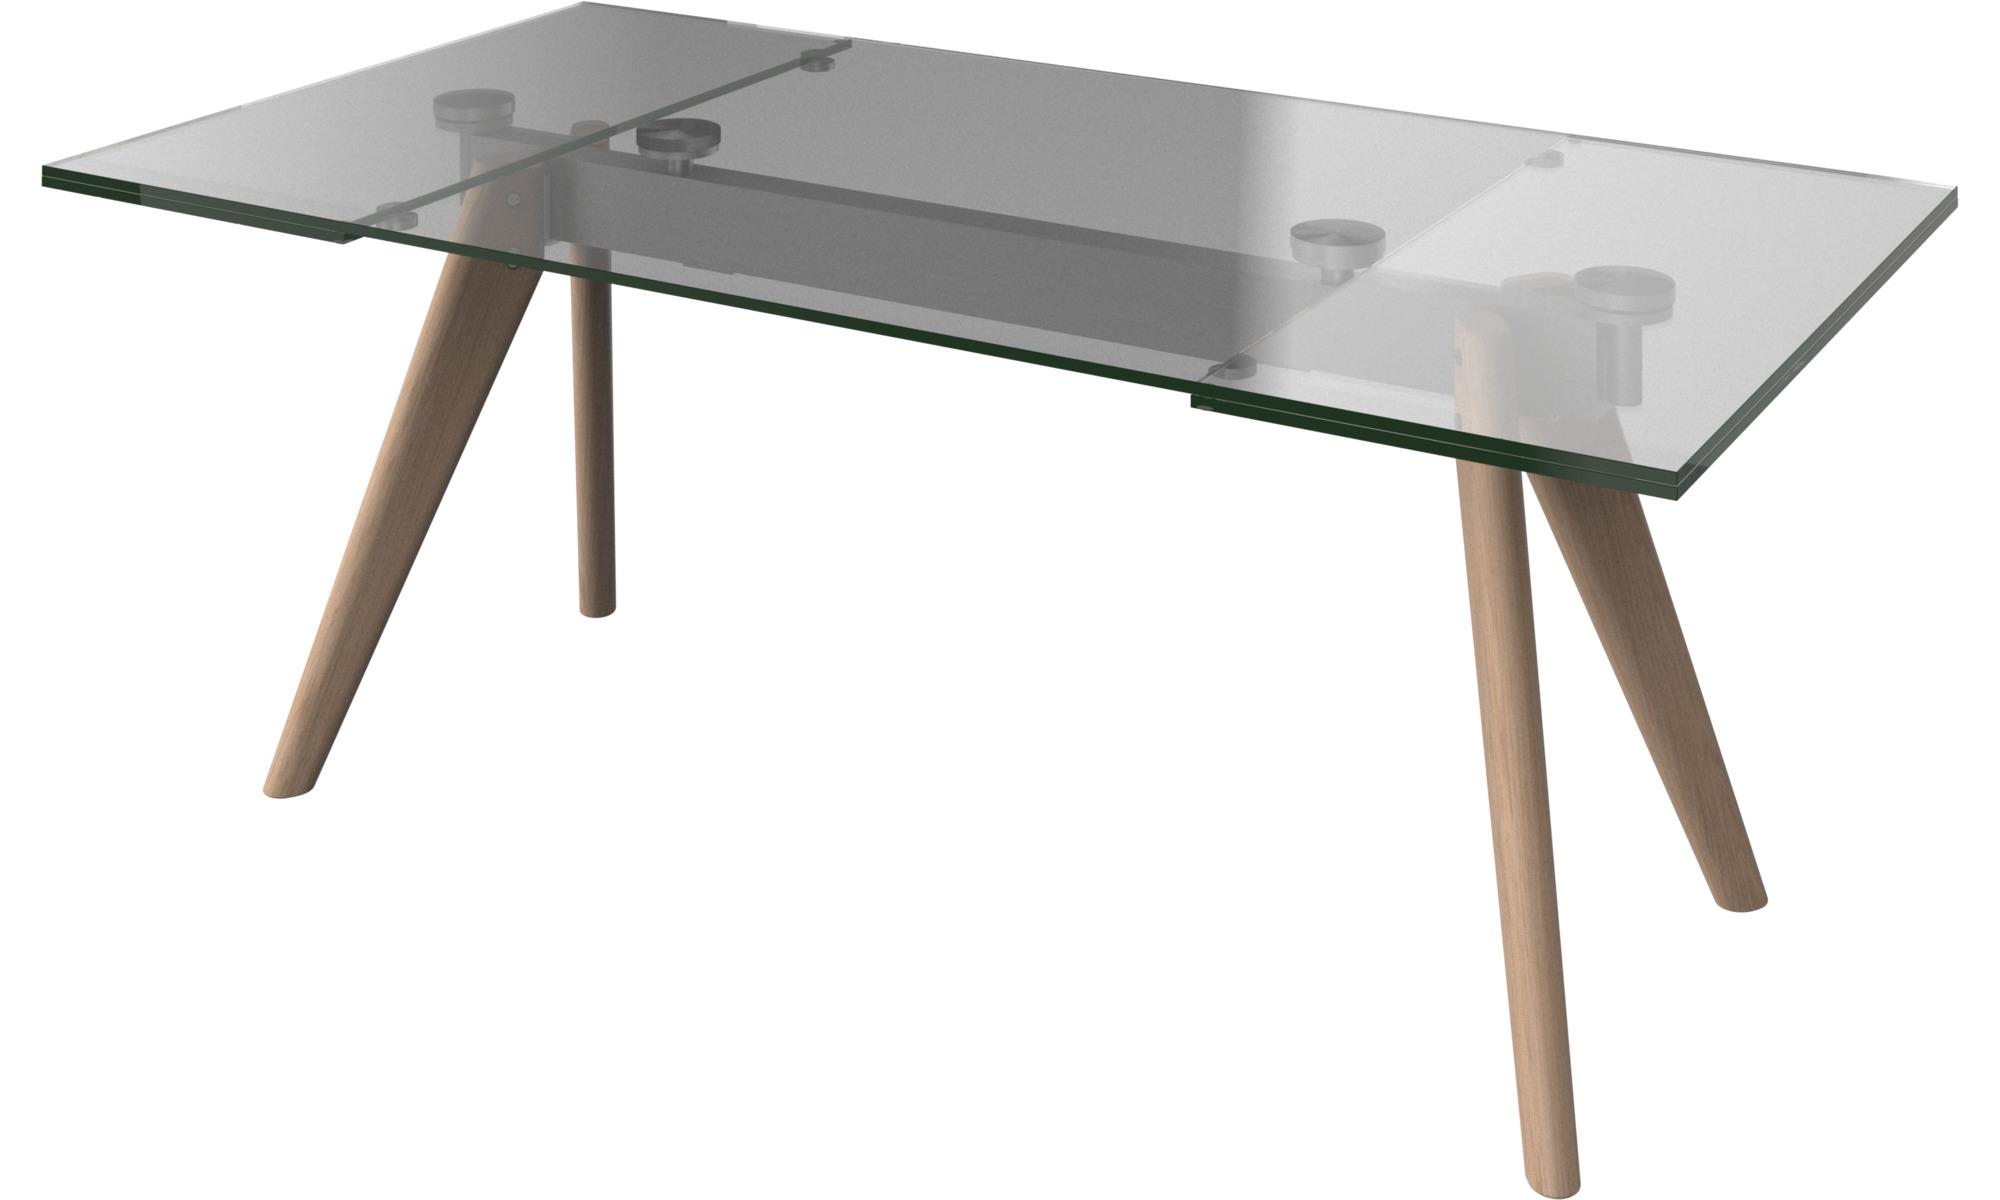 Mesas de comedor - mesa extensible Monza con tableros ...